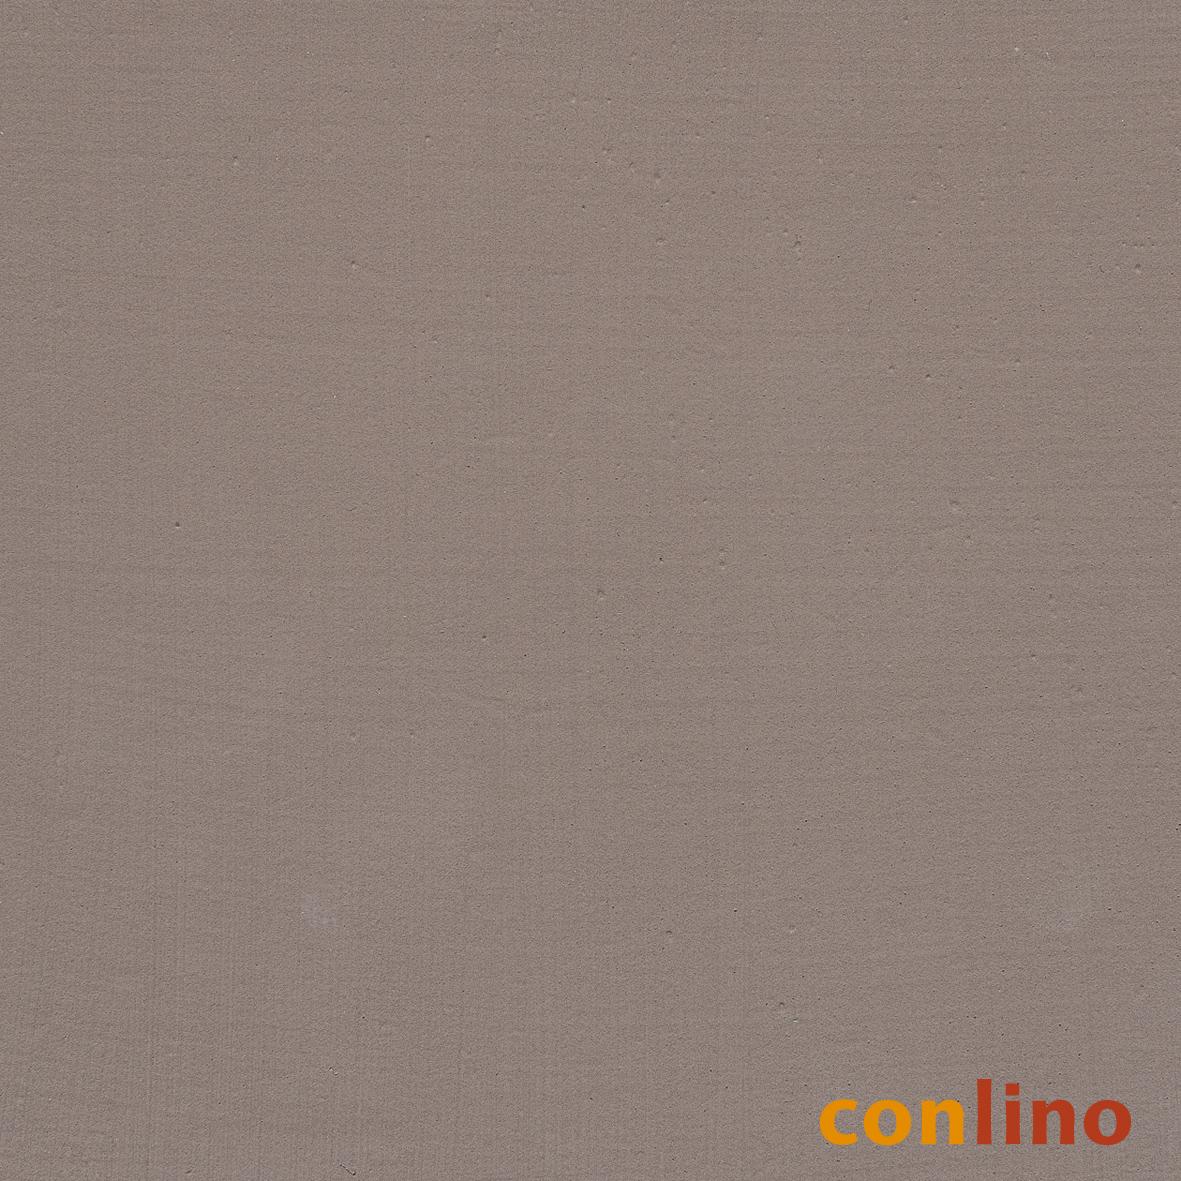 conlino Lehmfarbe Ardesia CL 110